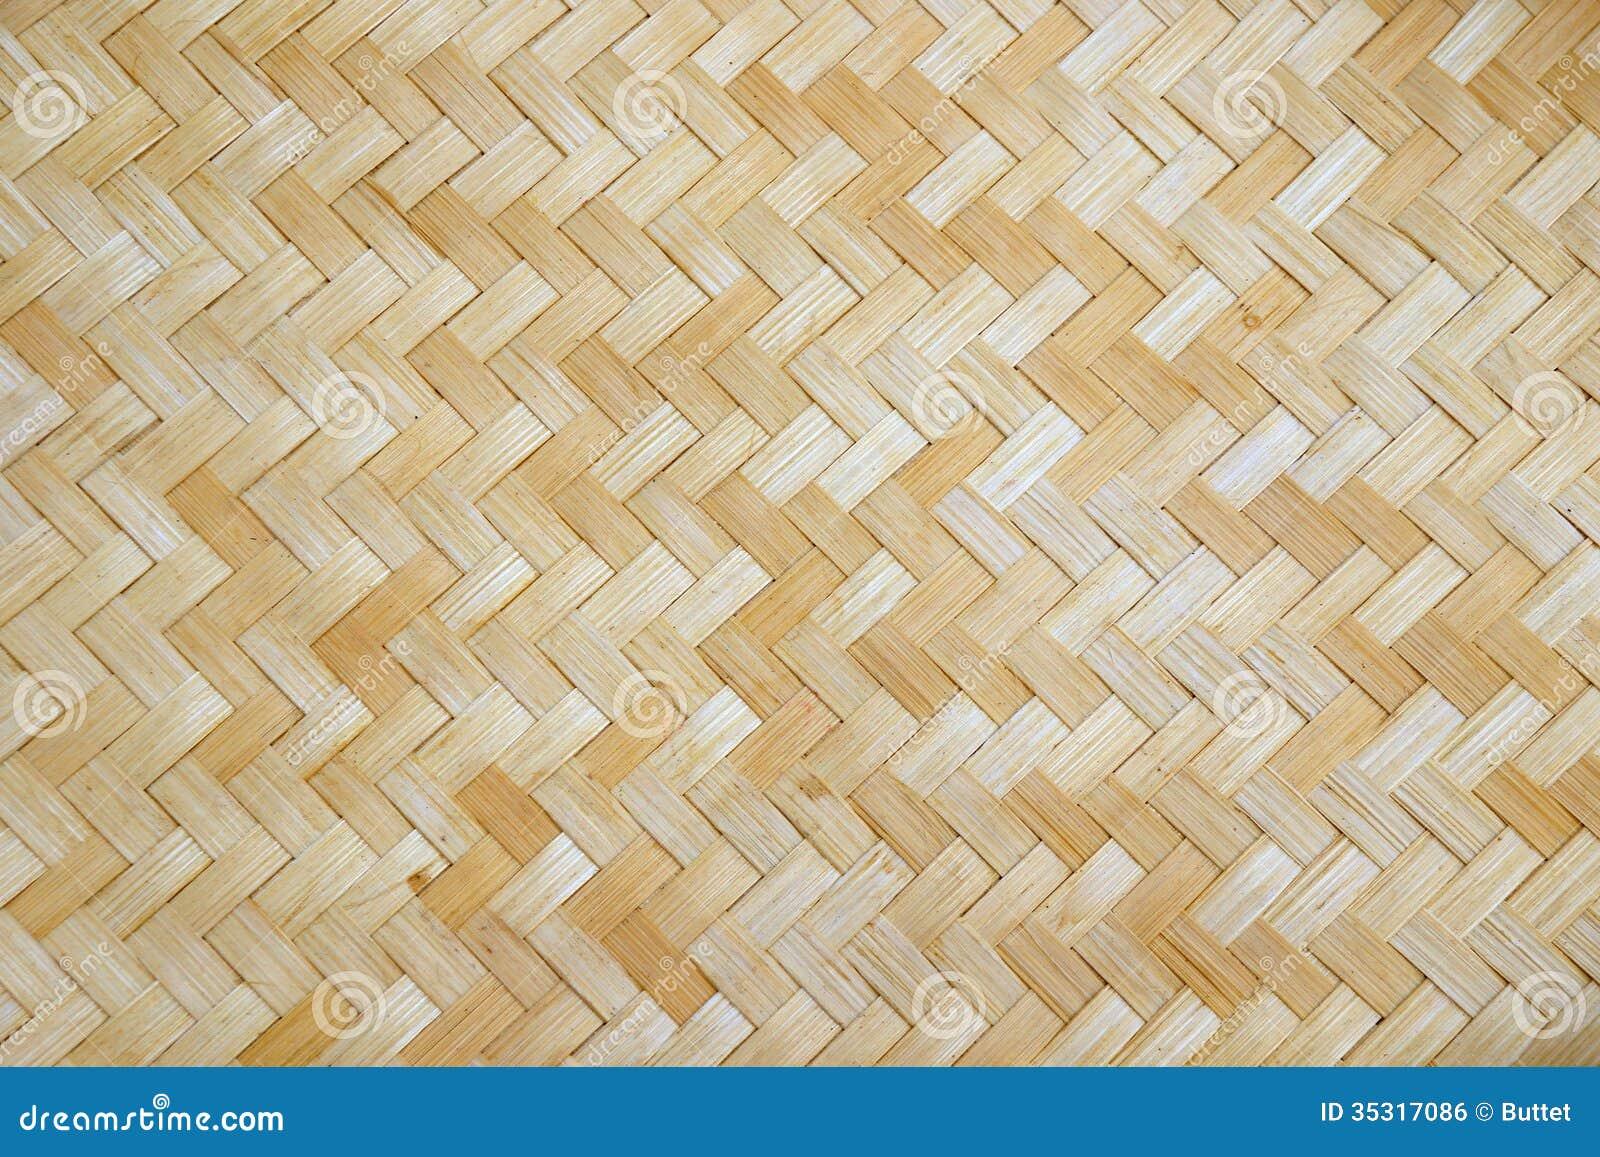 Bamboo wood texture